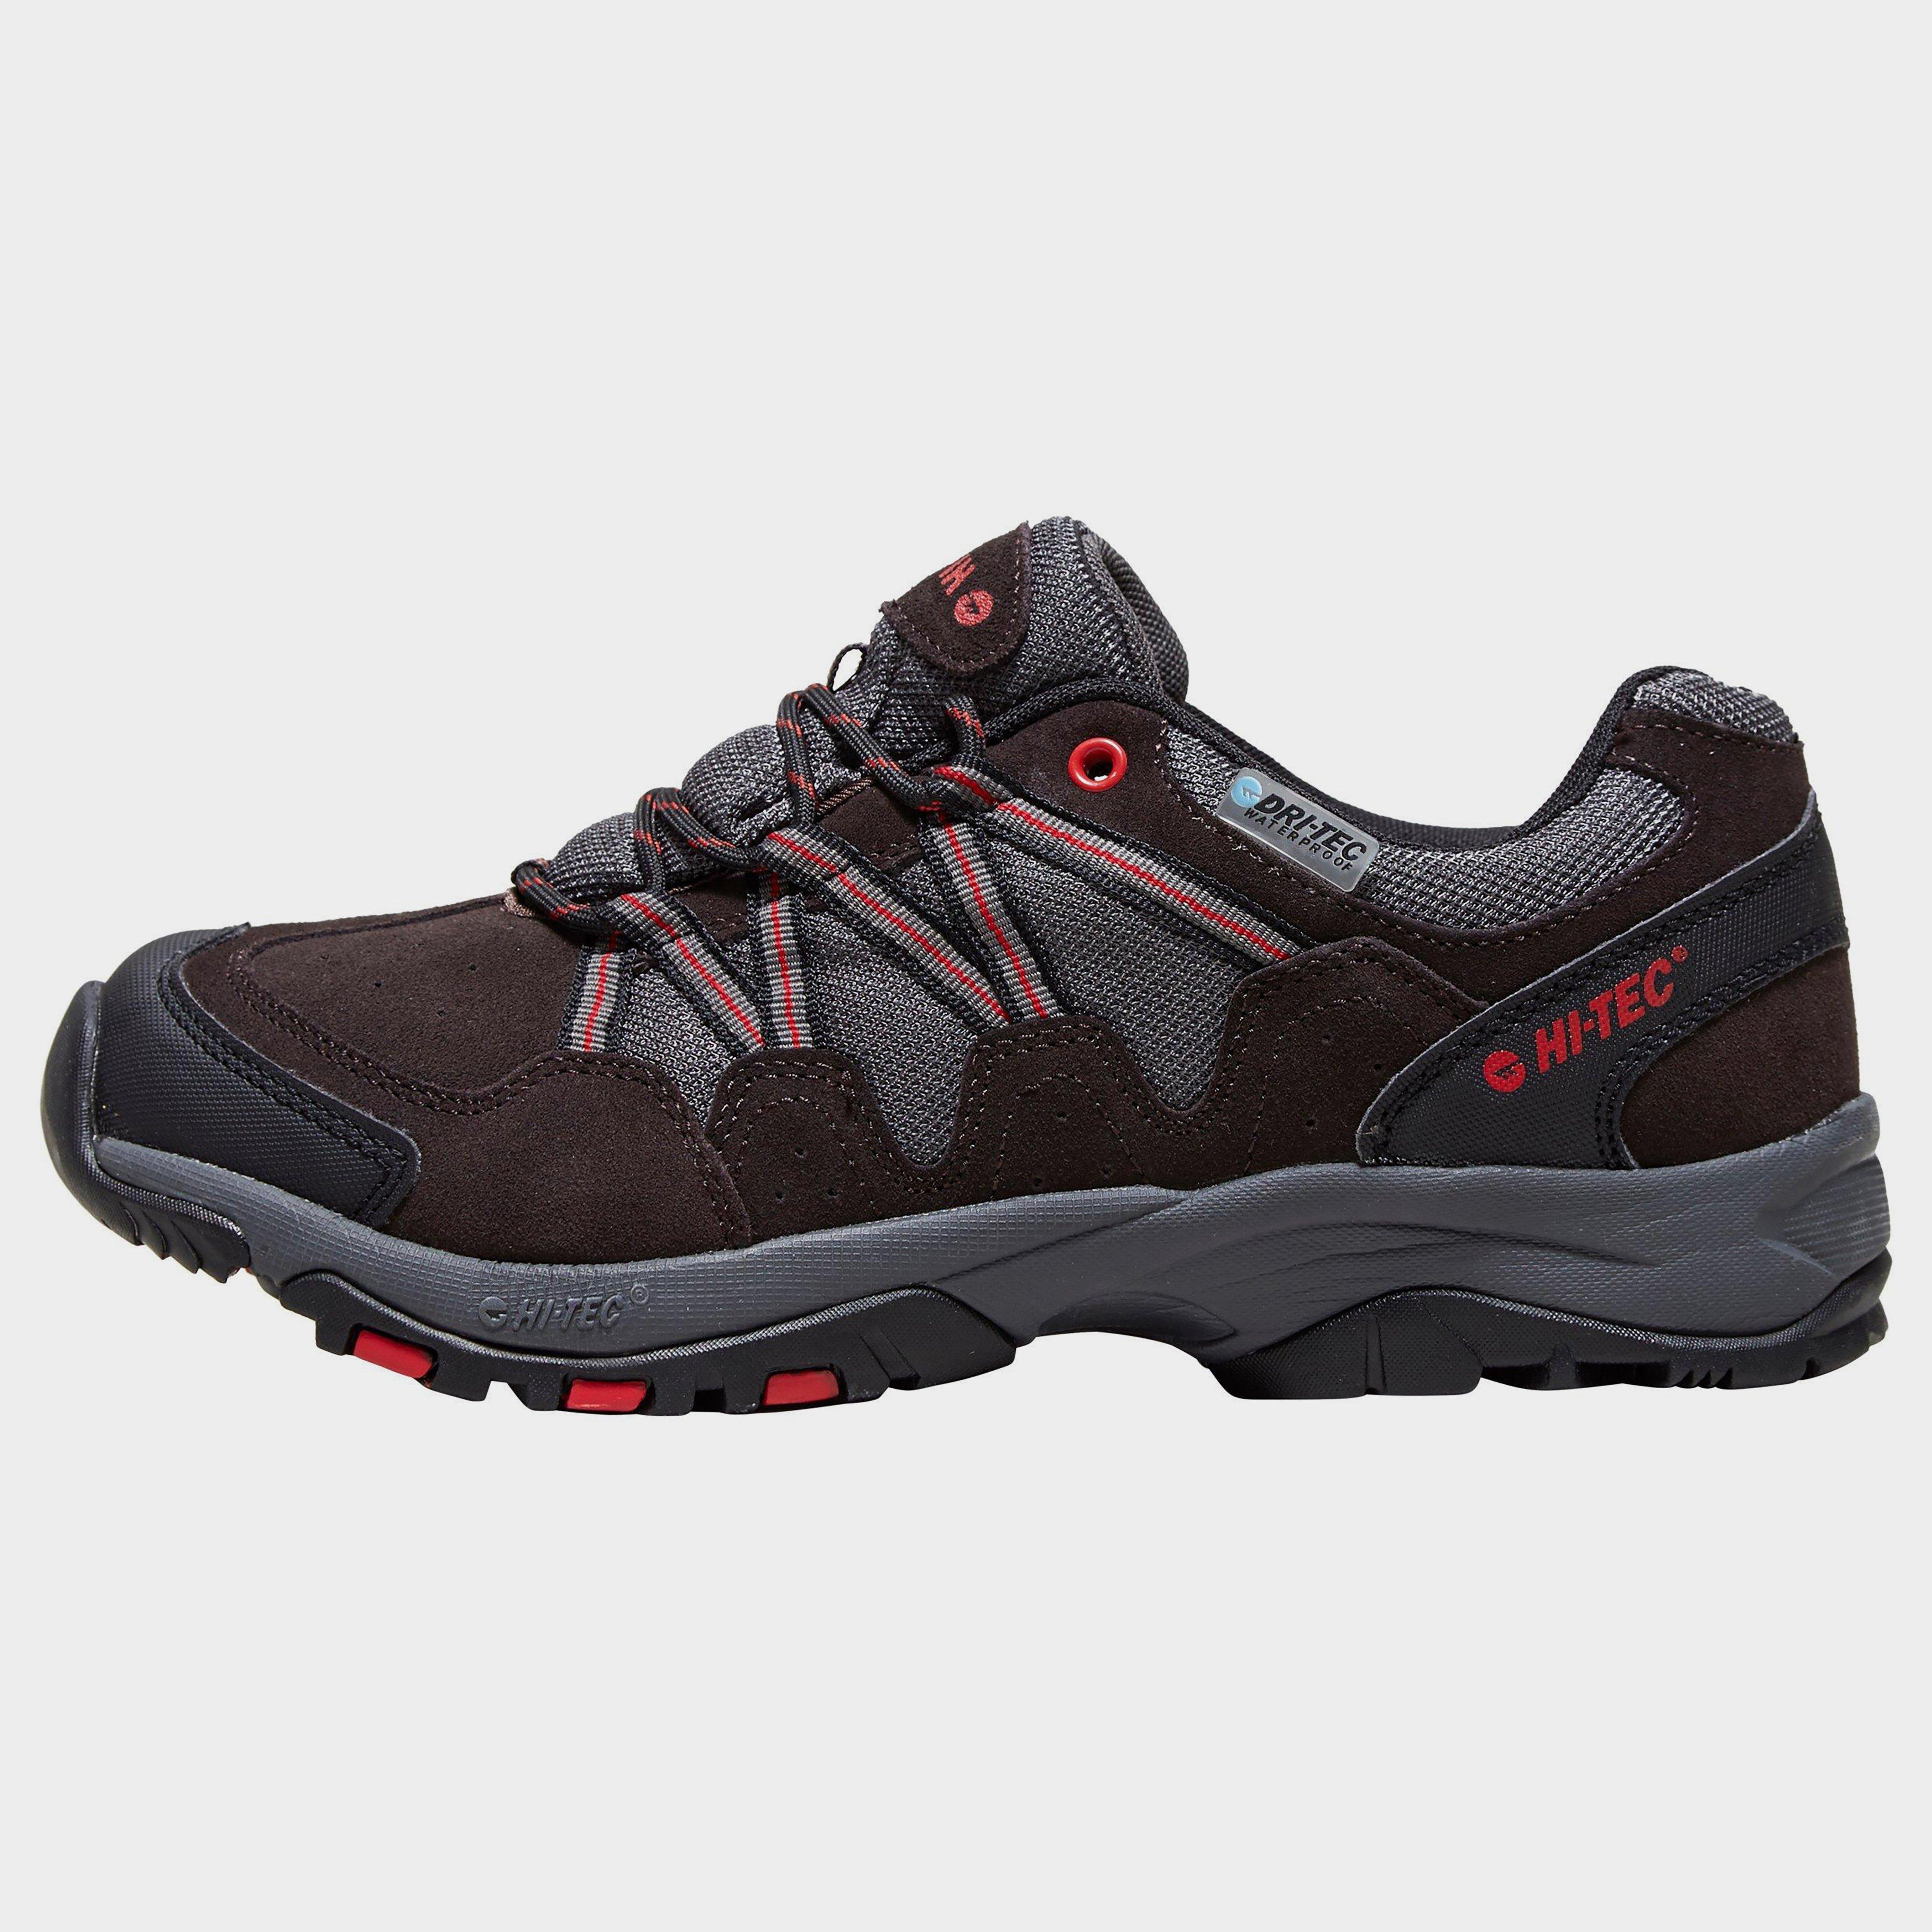 Hi Tec Hi Tec Mens Dexter Waterproof Hiking Shoe - Black, Black